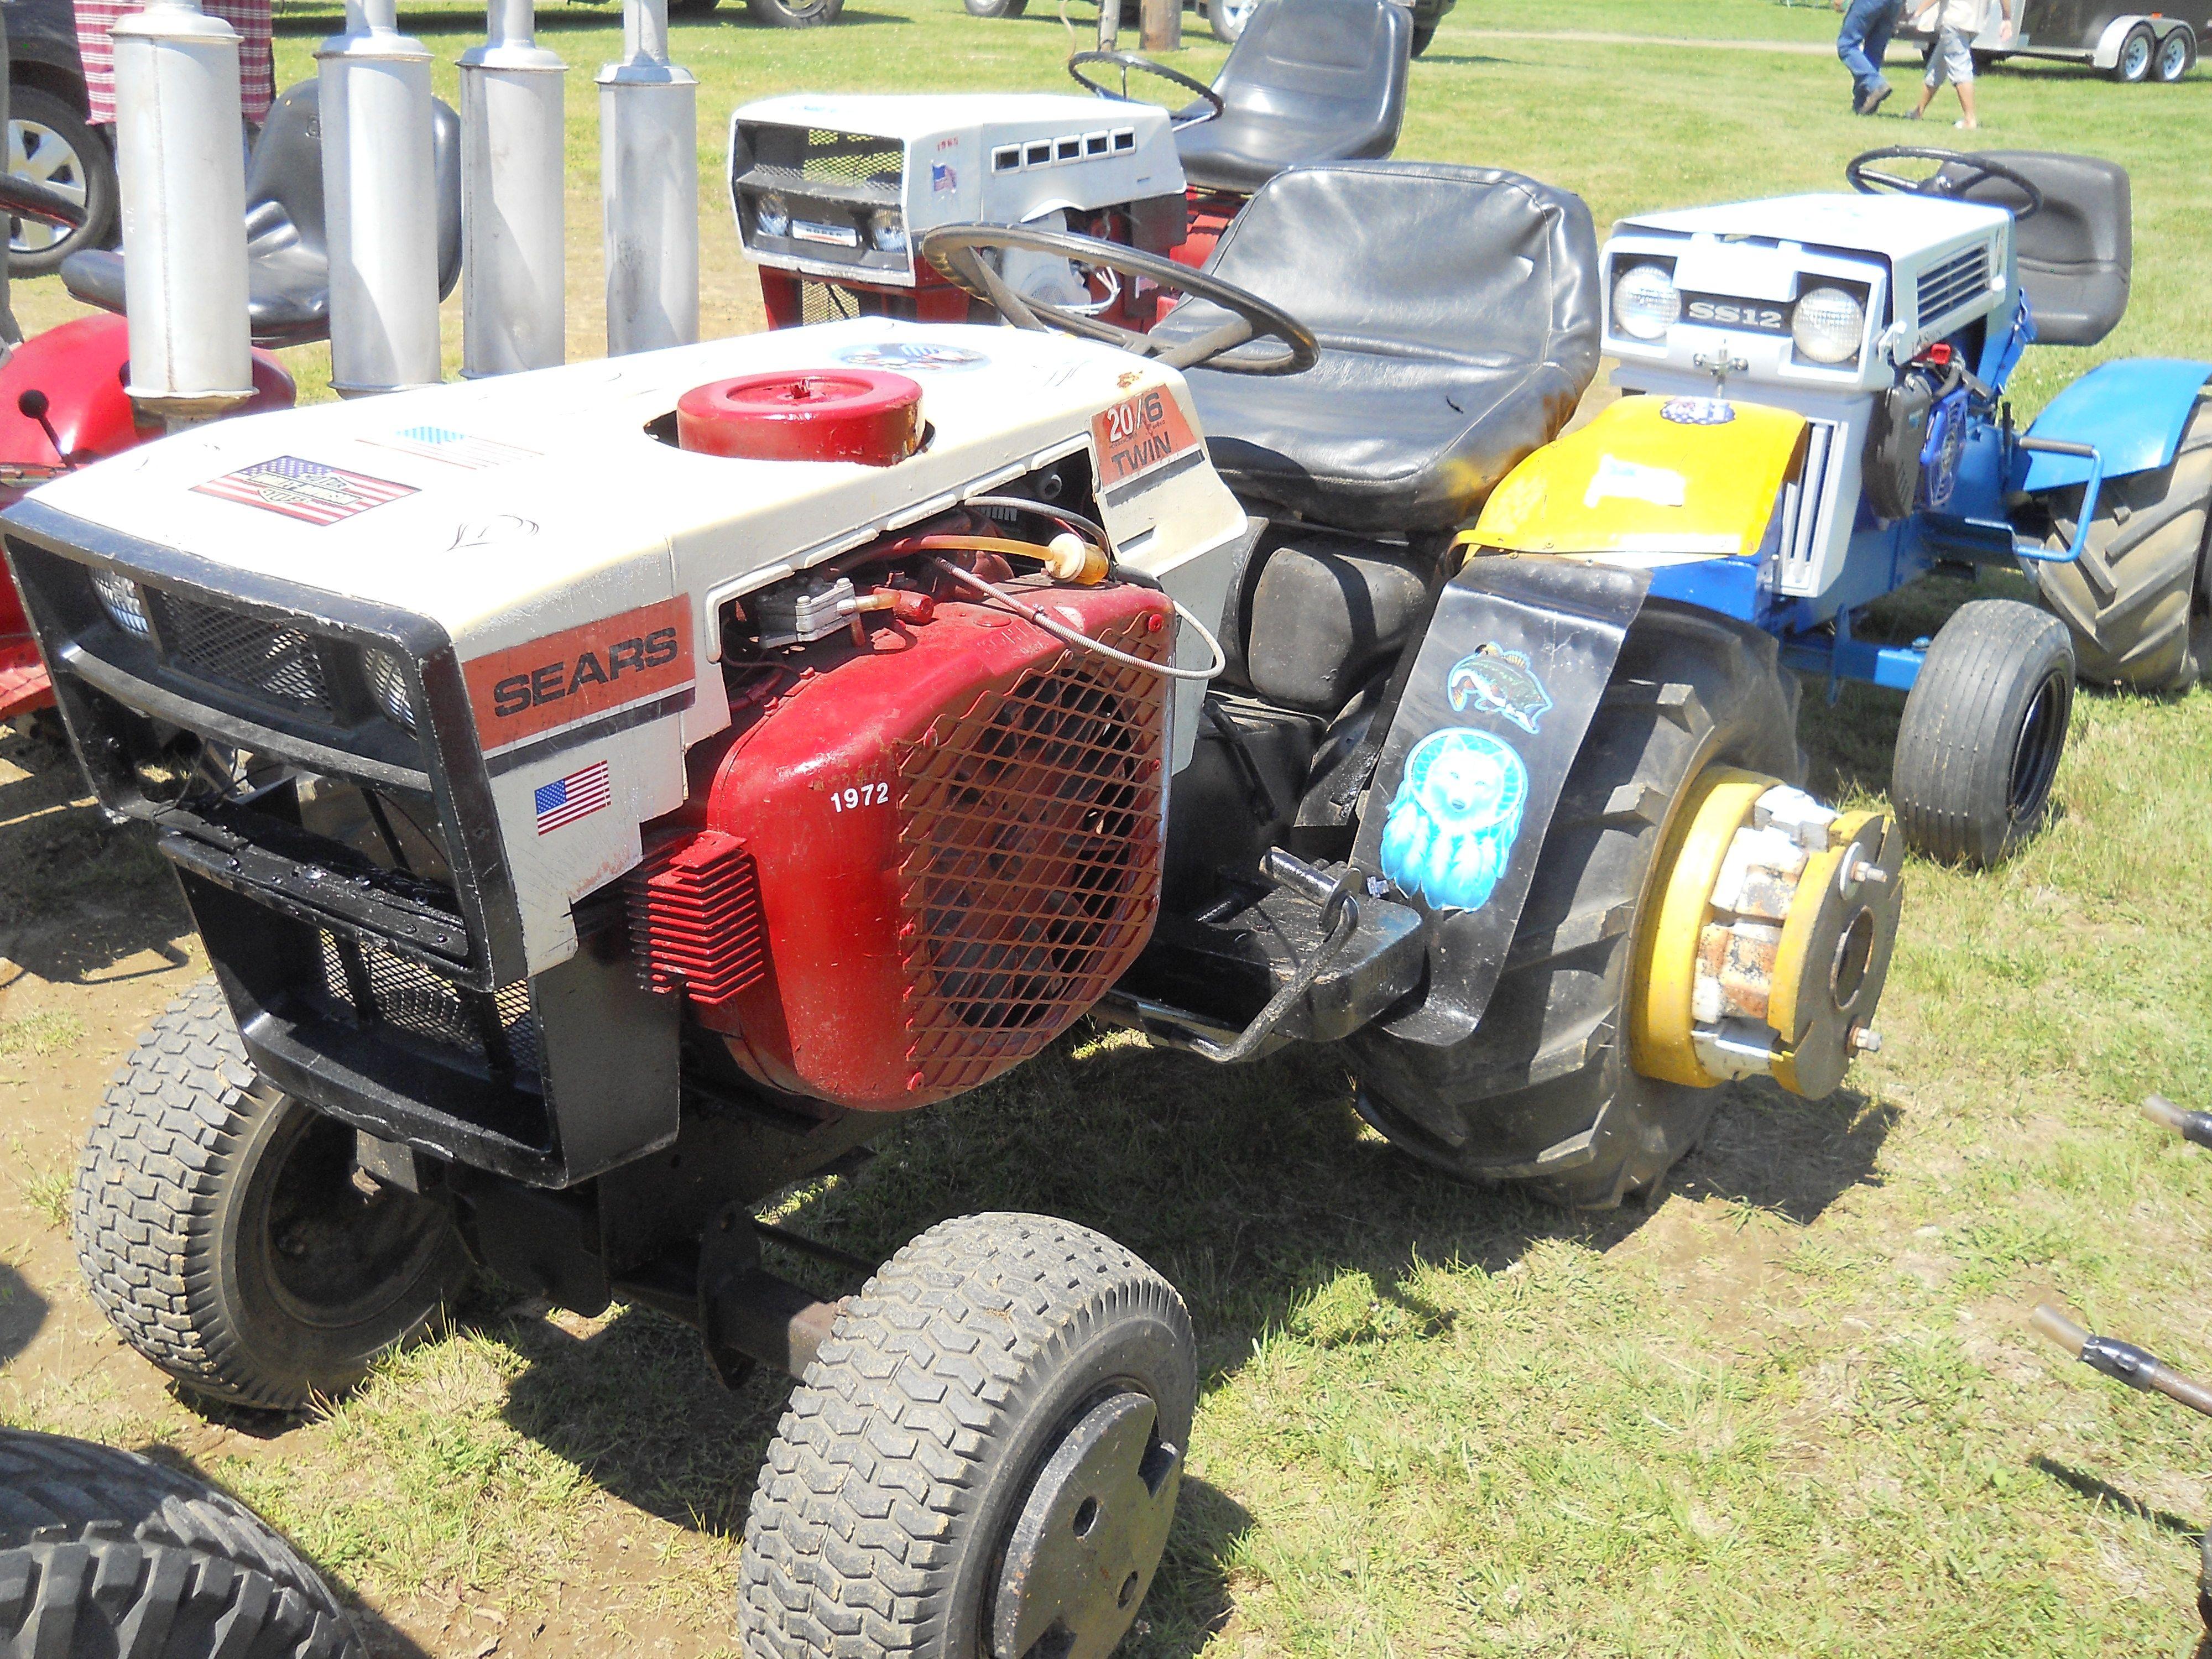 Sears Lawn Mower : Sears lawn garden tractor mowers very small